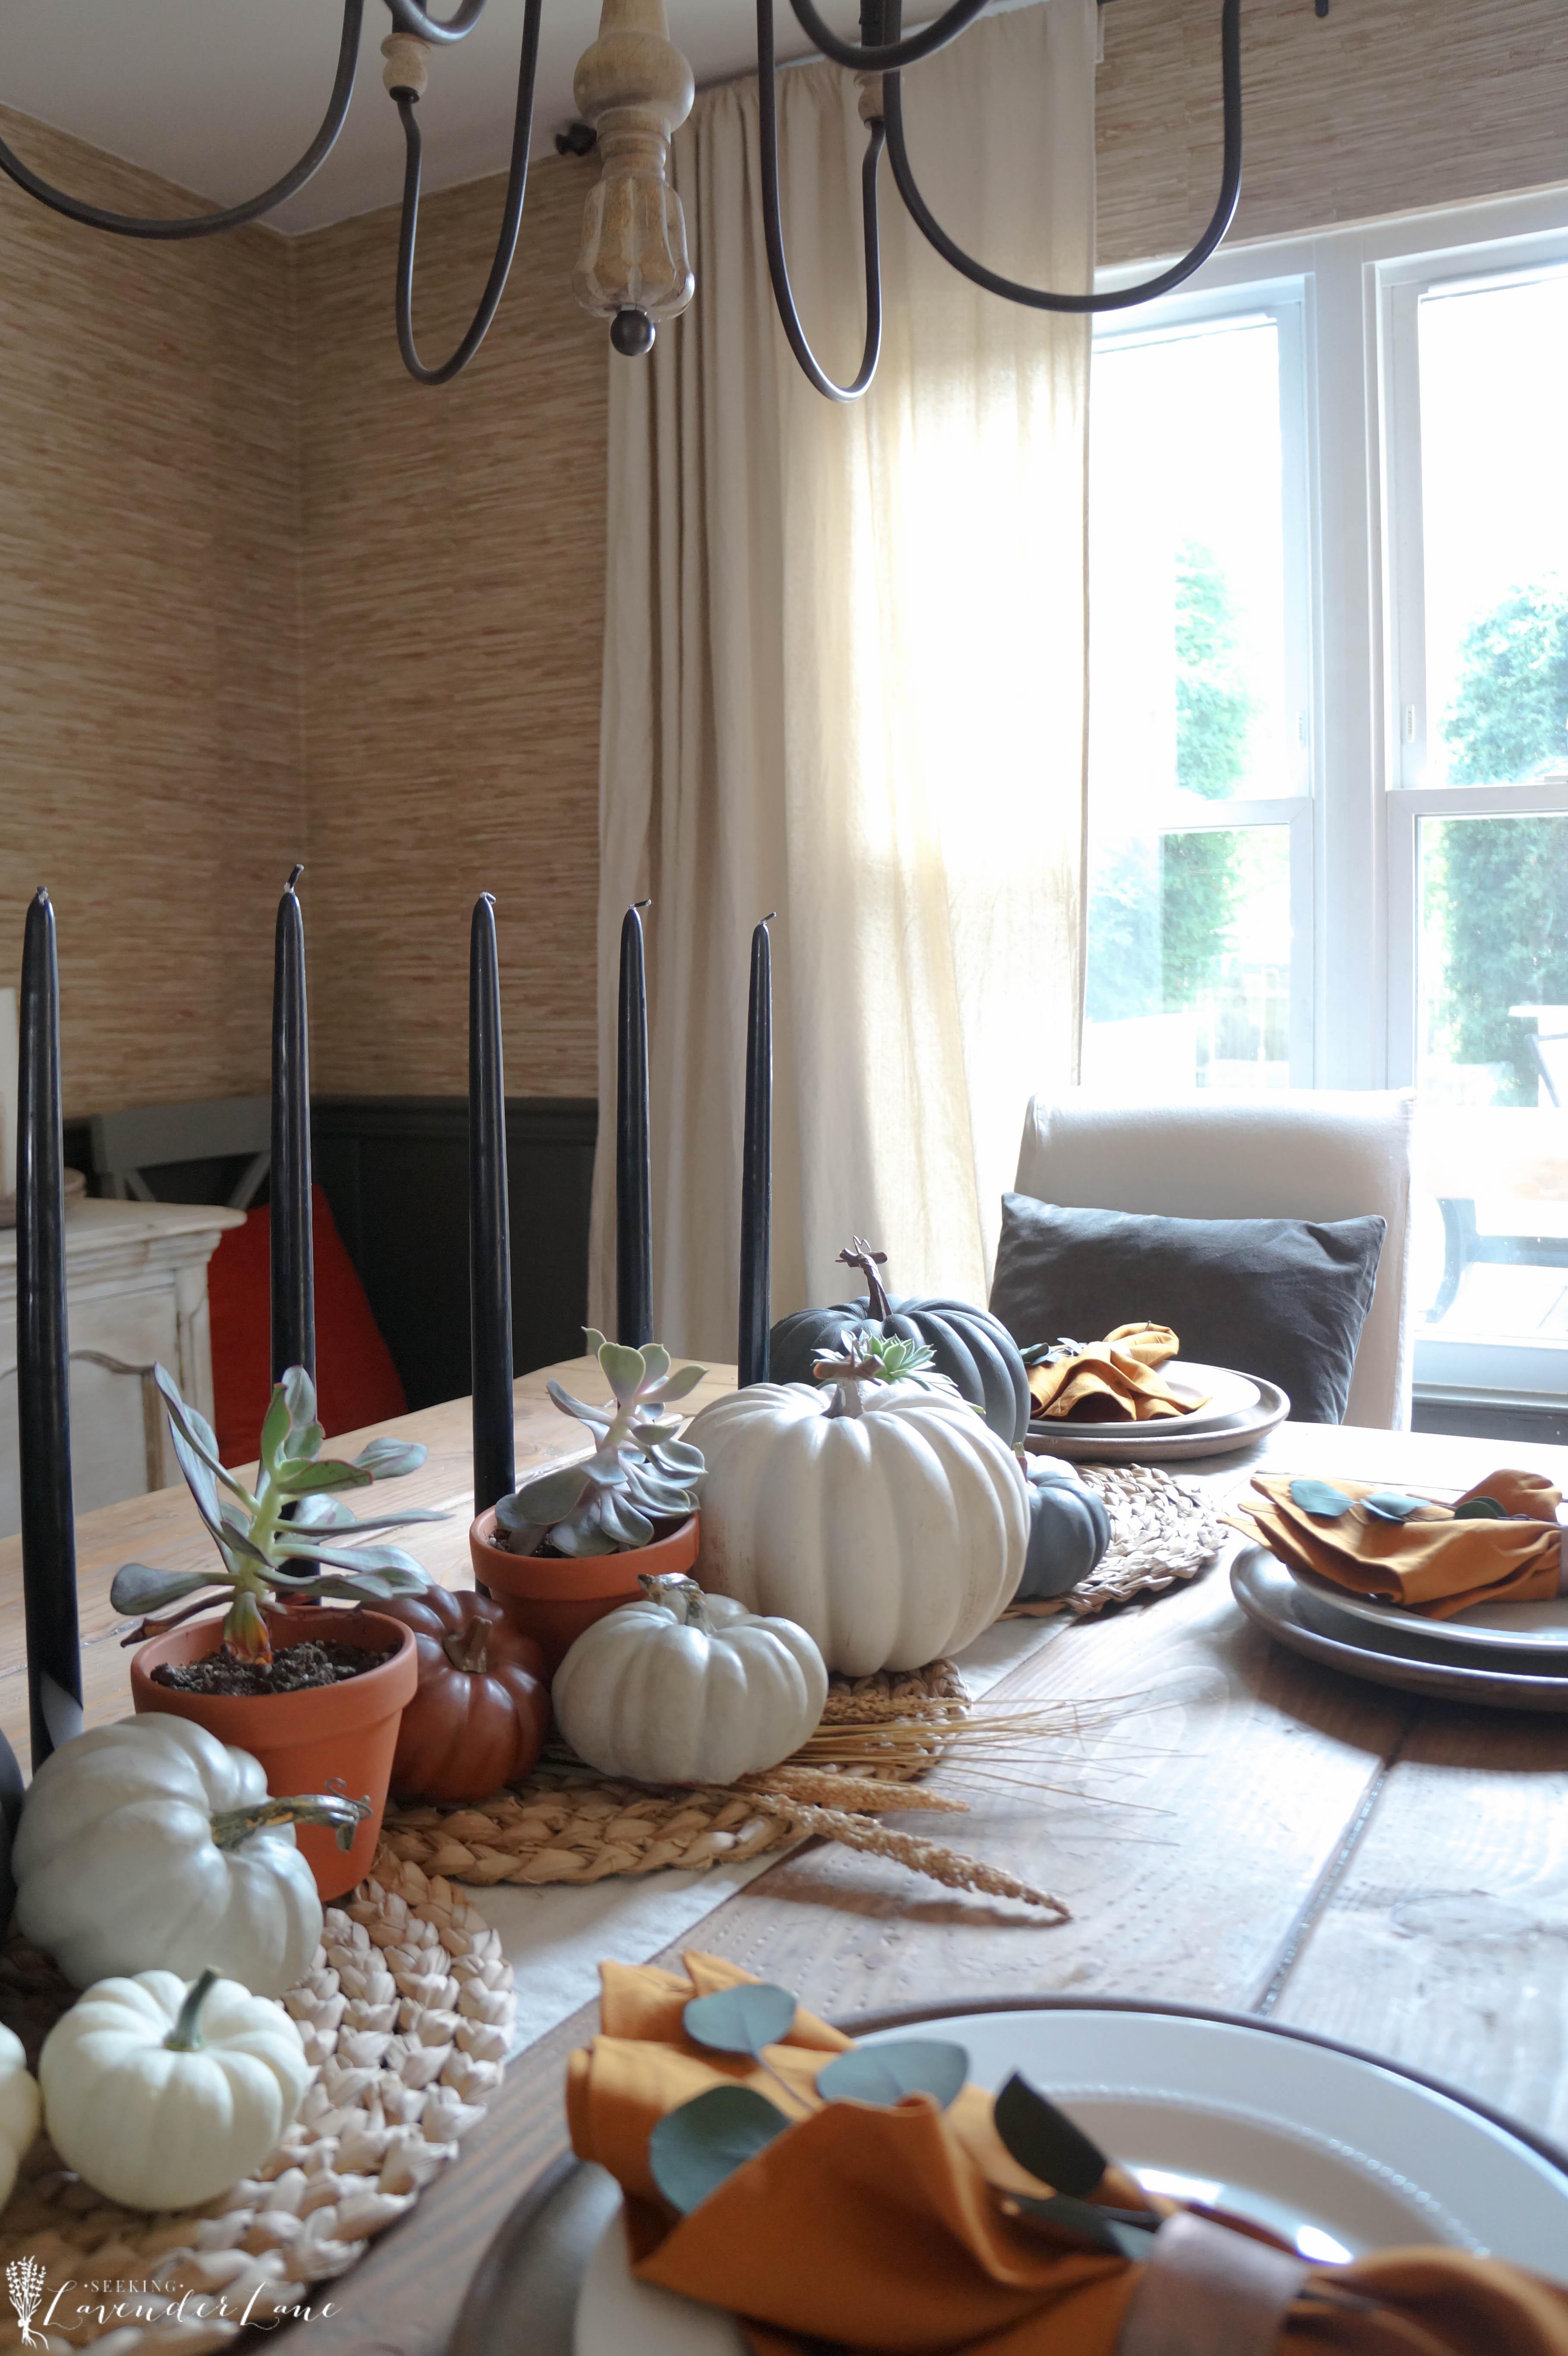 Farmhouse Decor For Living Rooms: Seeking Lavendar Lane